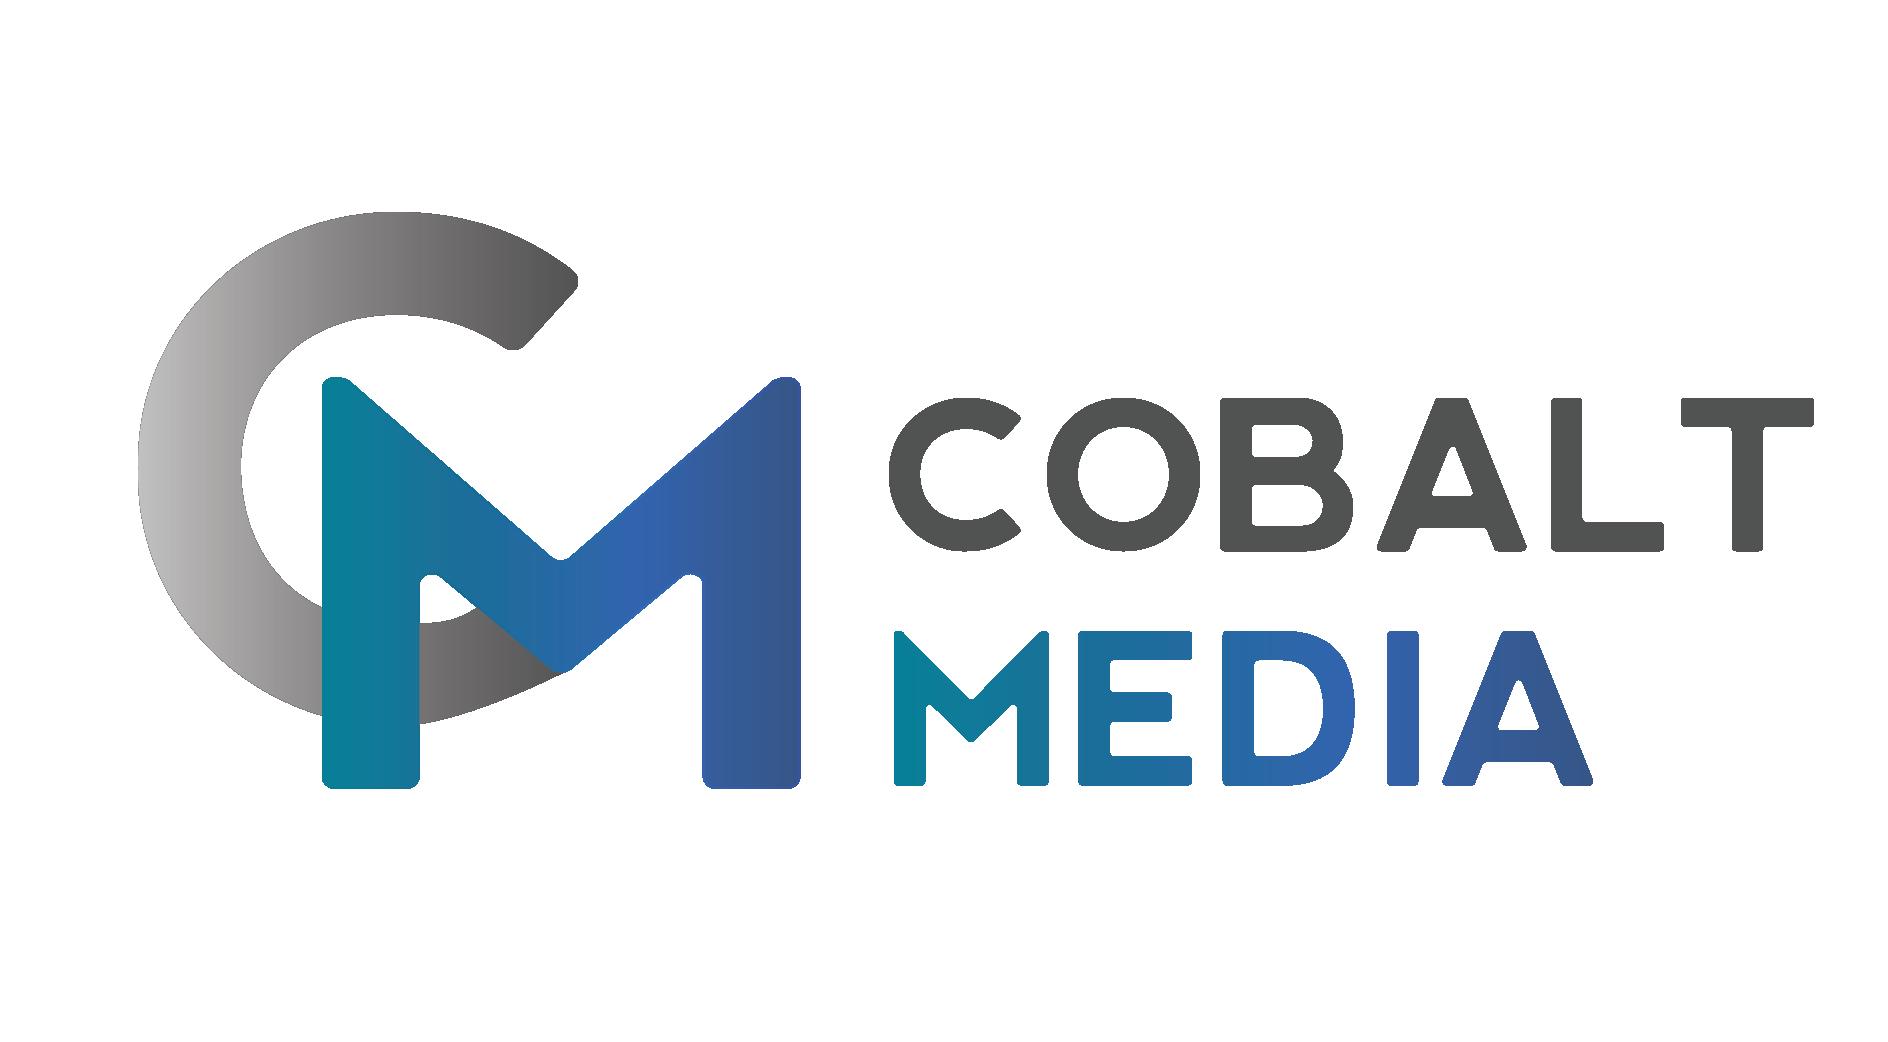 Cobalt Media